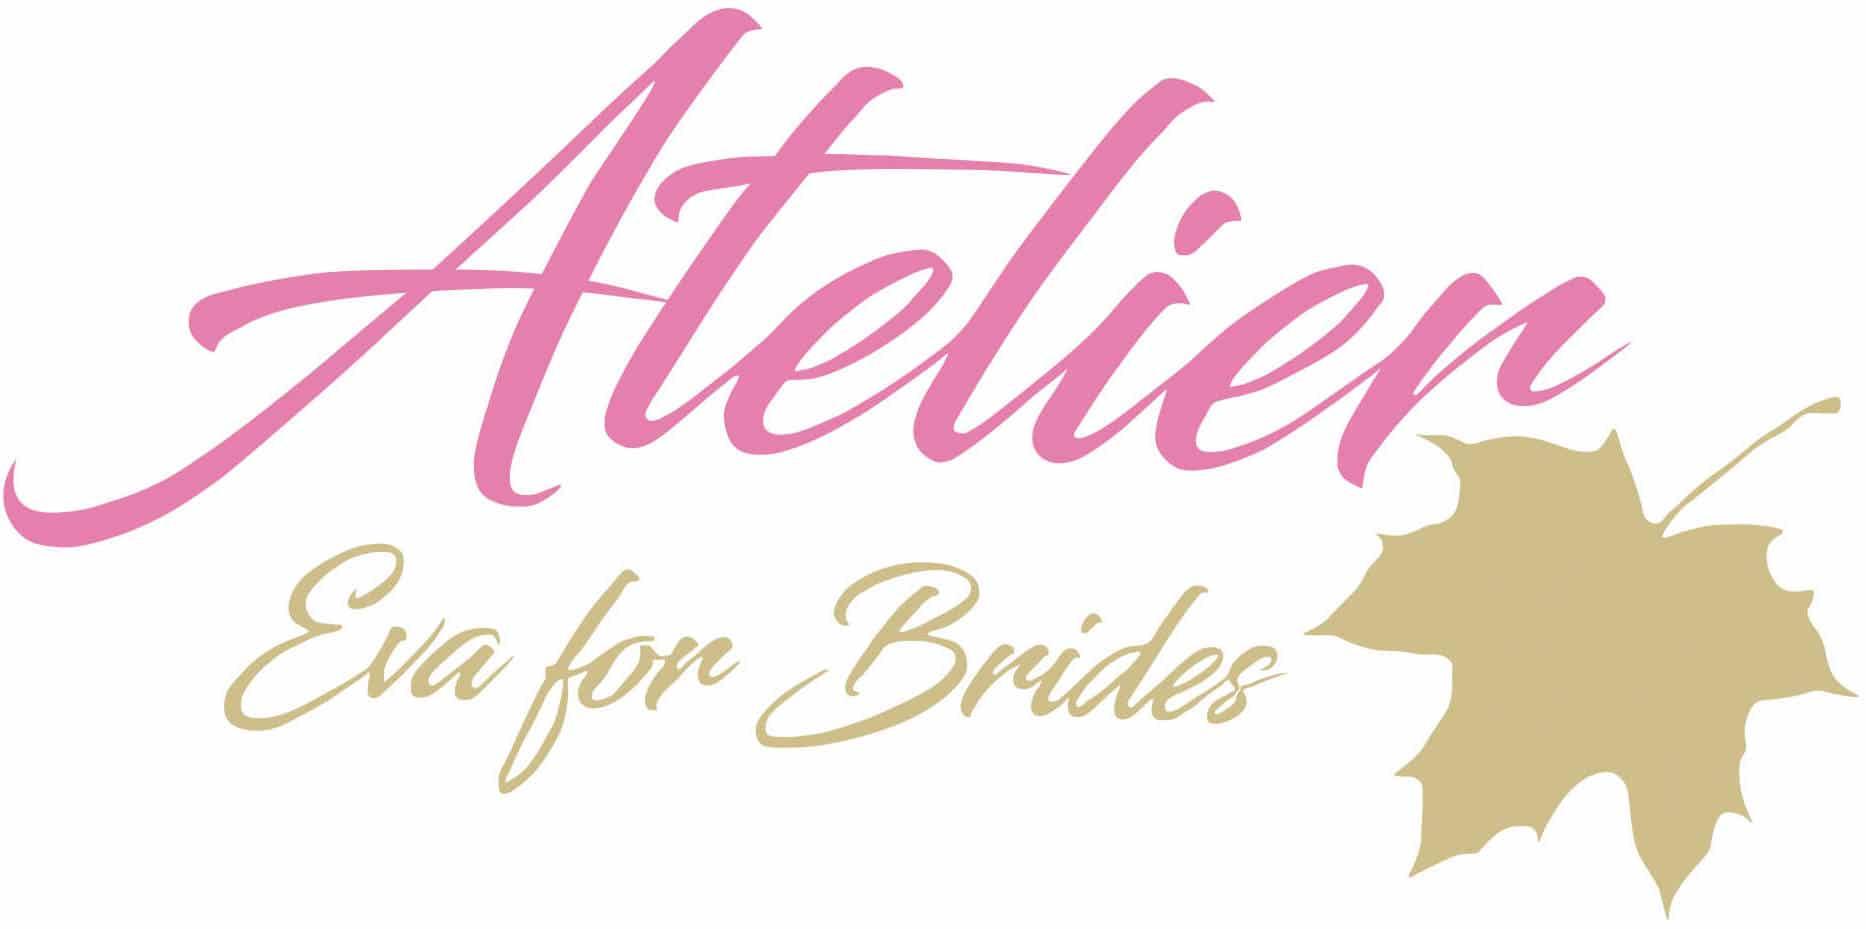 logo-atelier-eva-for-brides